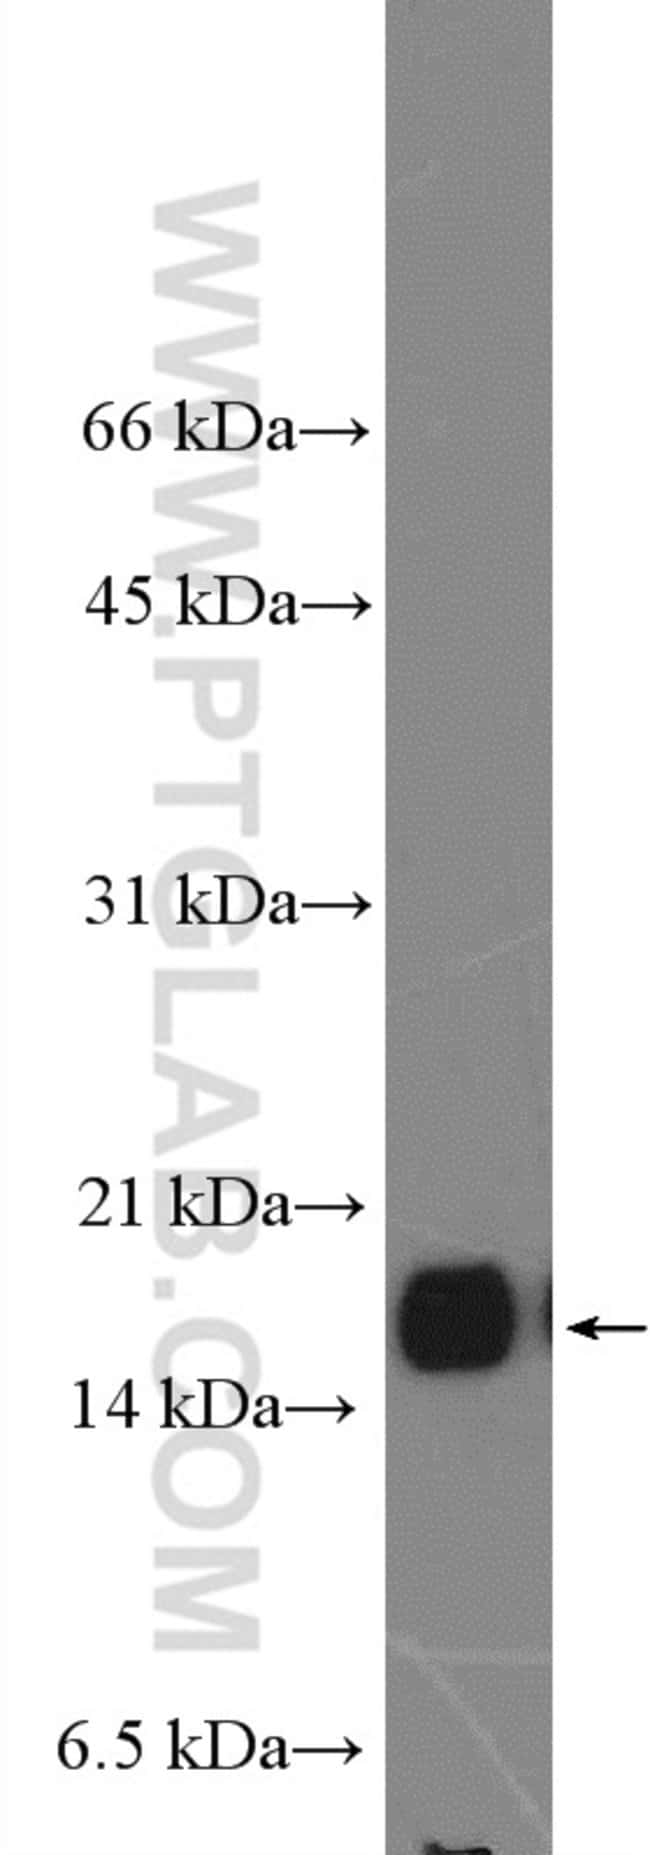 VAMP3/Cellubrevin Rabbit anti-Human, Mouse, Rat, Polyclonal, Proteintech 150 μL; Unconjugated Produkte